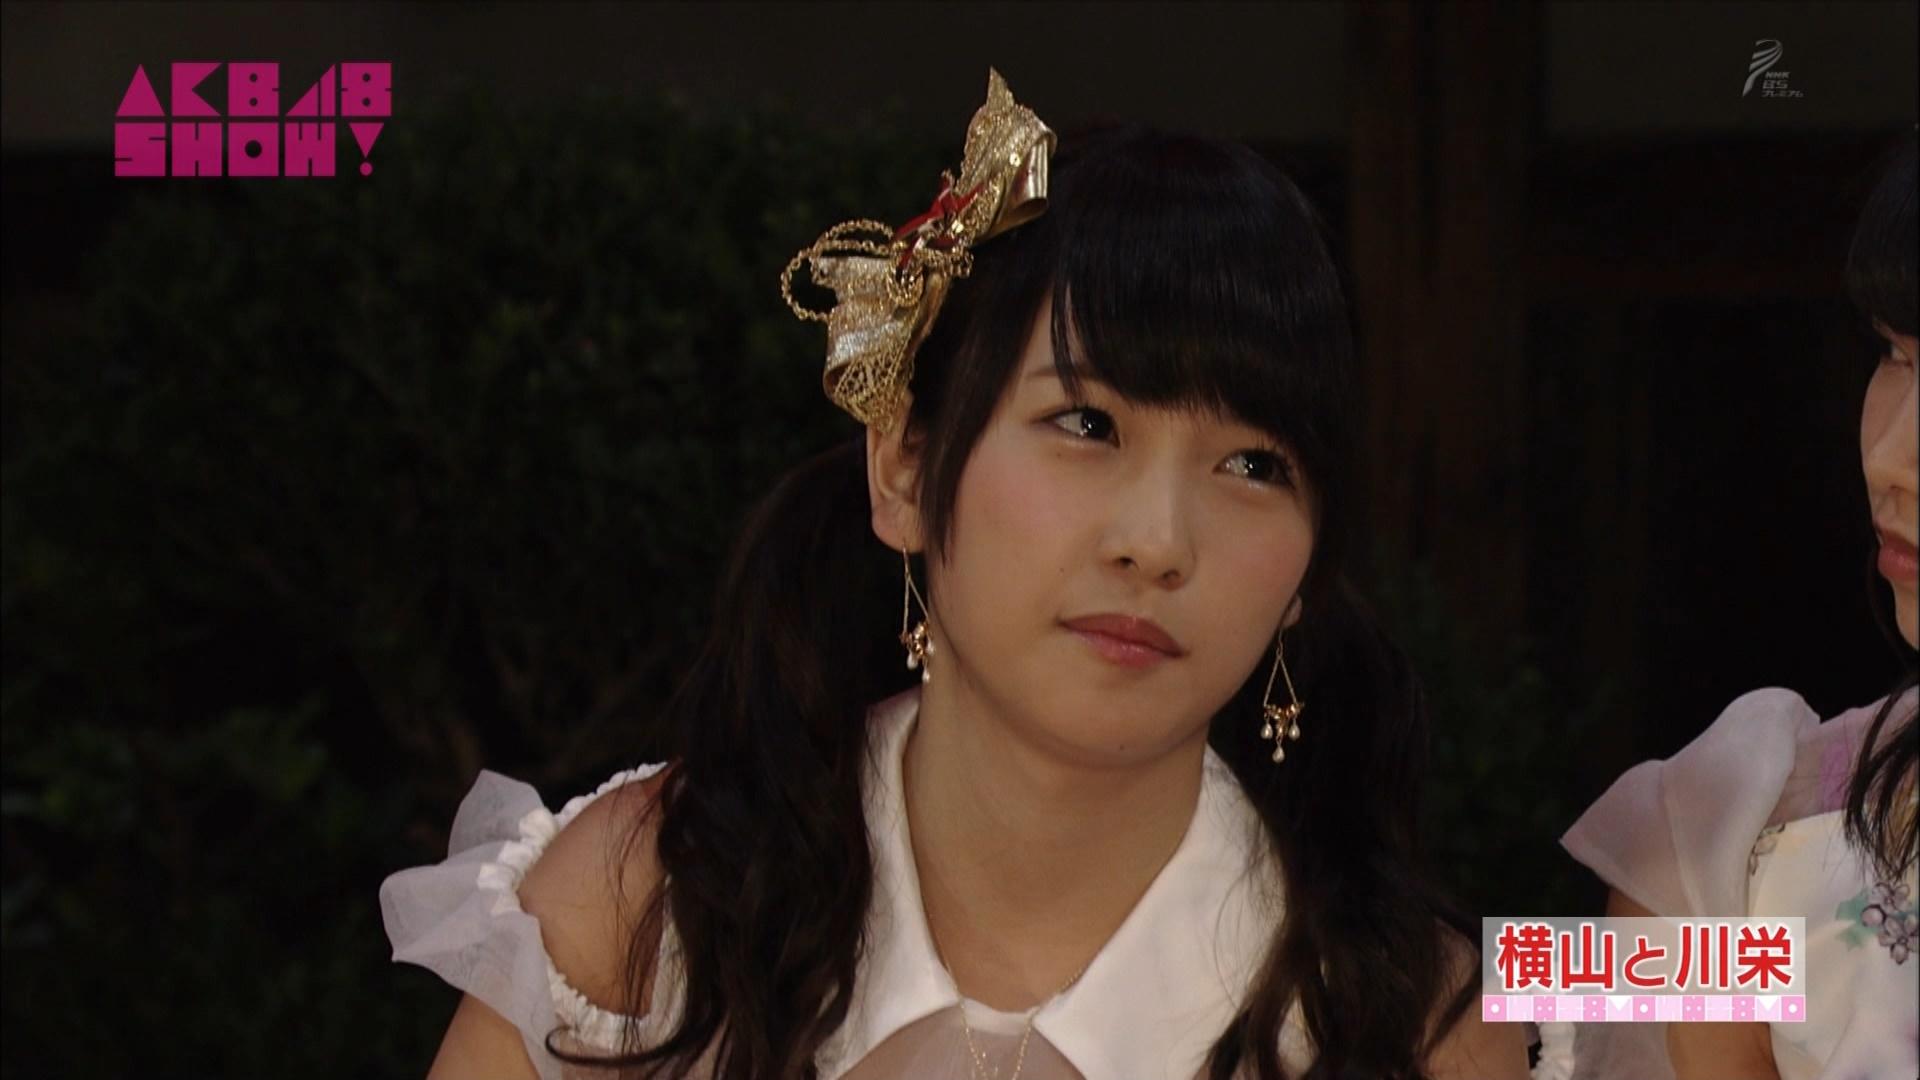 横山由依と川栄李奈 AKB48SHOW! 20140906 (32)